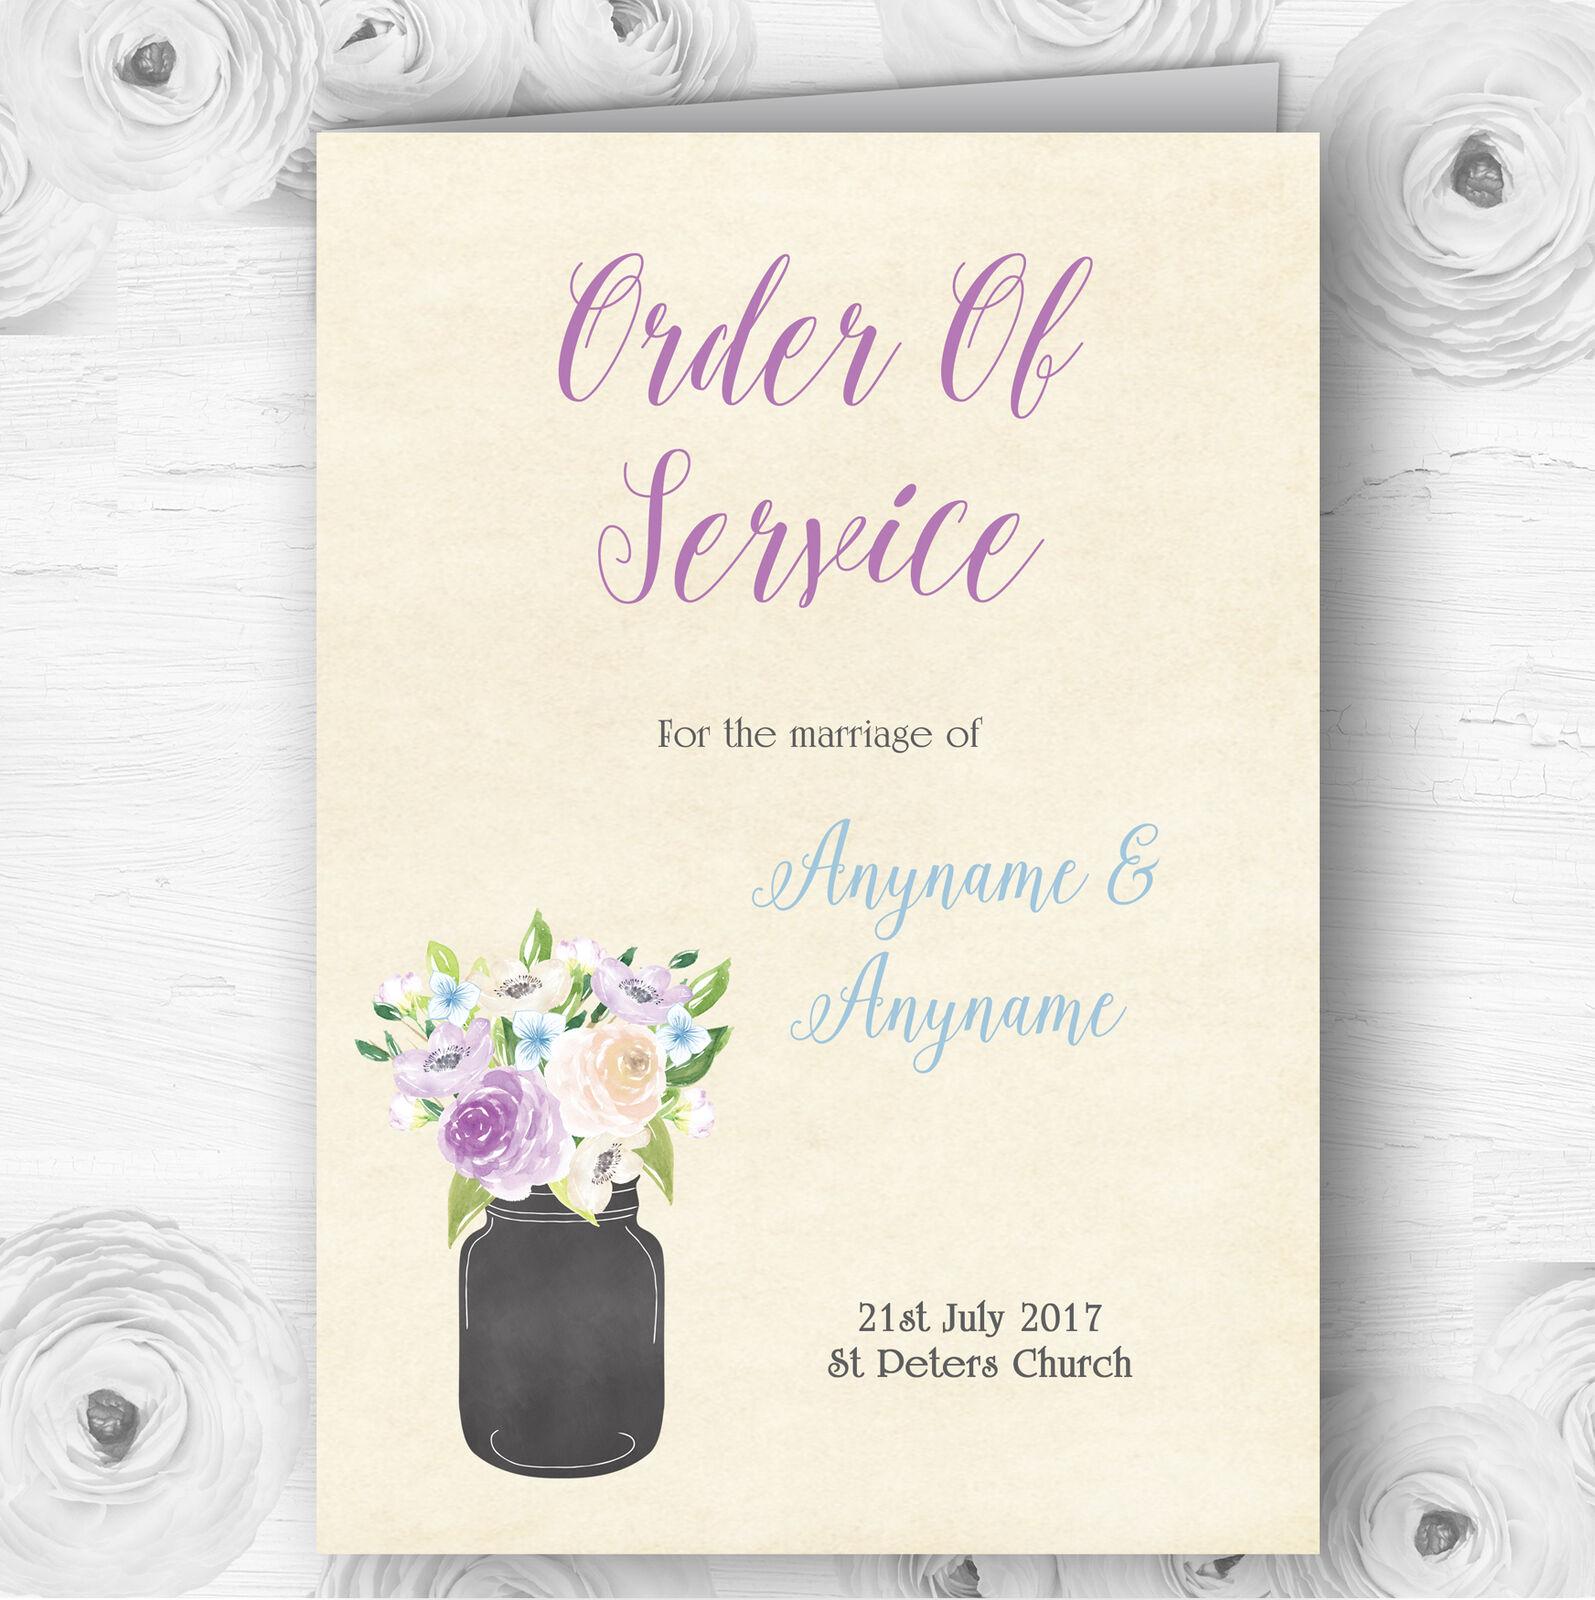 Lilac & Blau Flower Vase Vintage Wedding Double Sided Cover Order Of Service